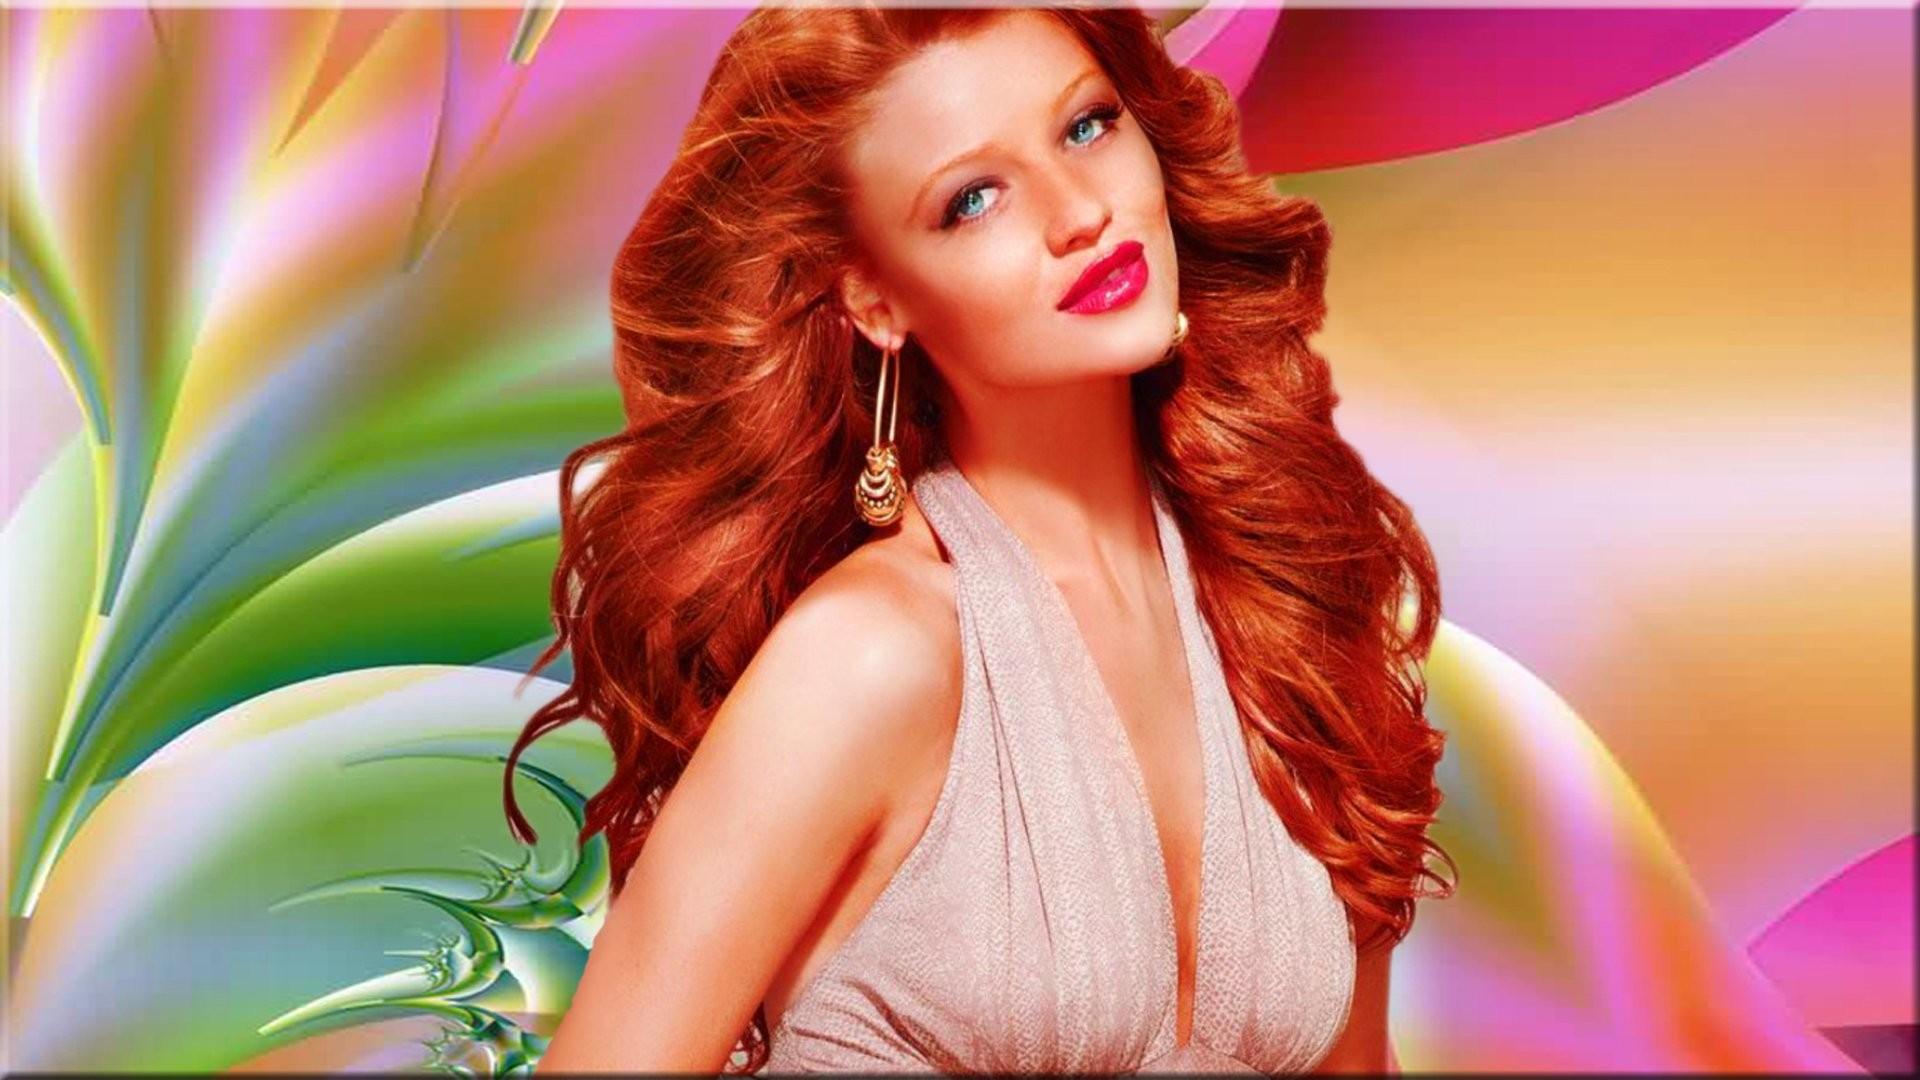 Women – Cintia Dicker Redhead Woman Wallpaper